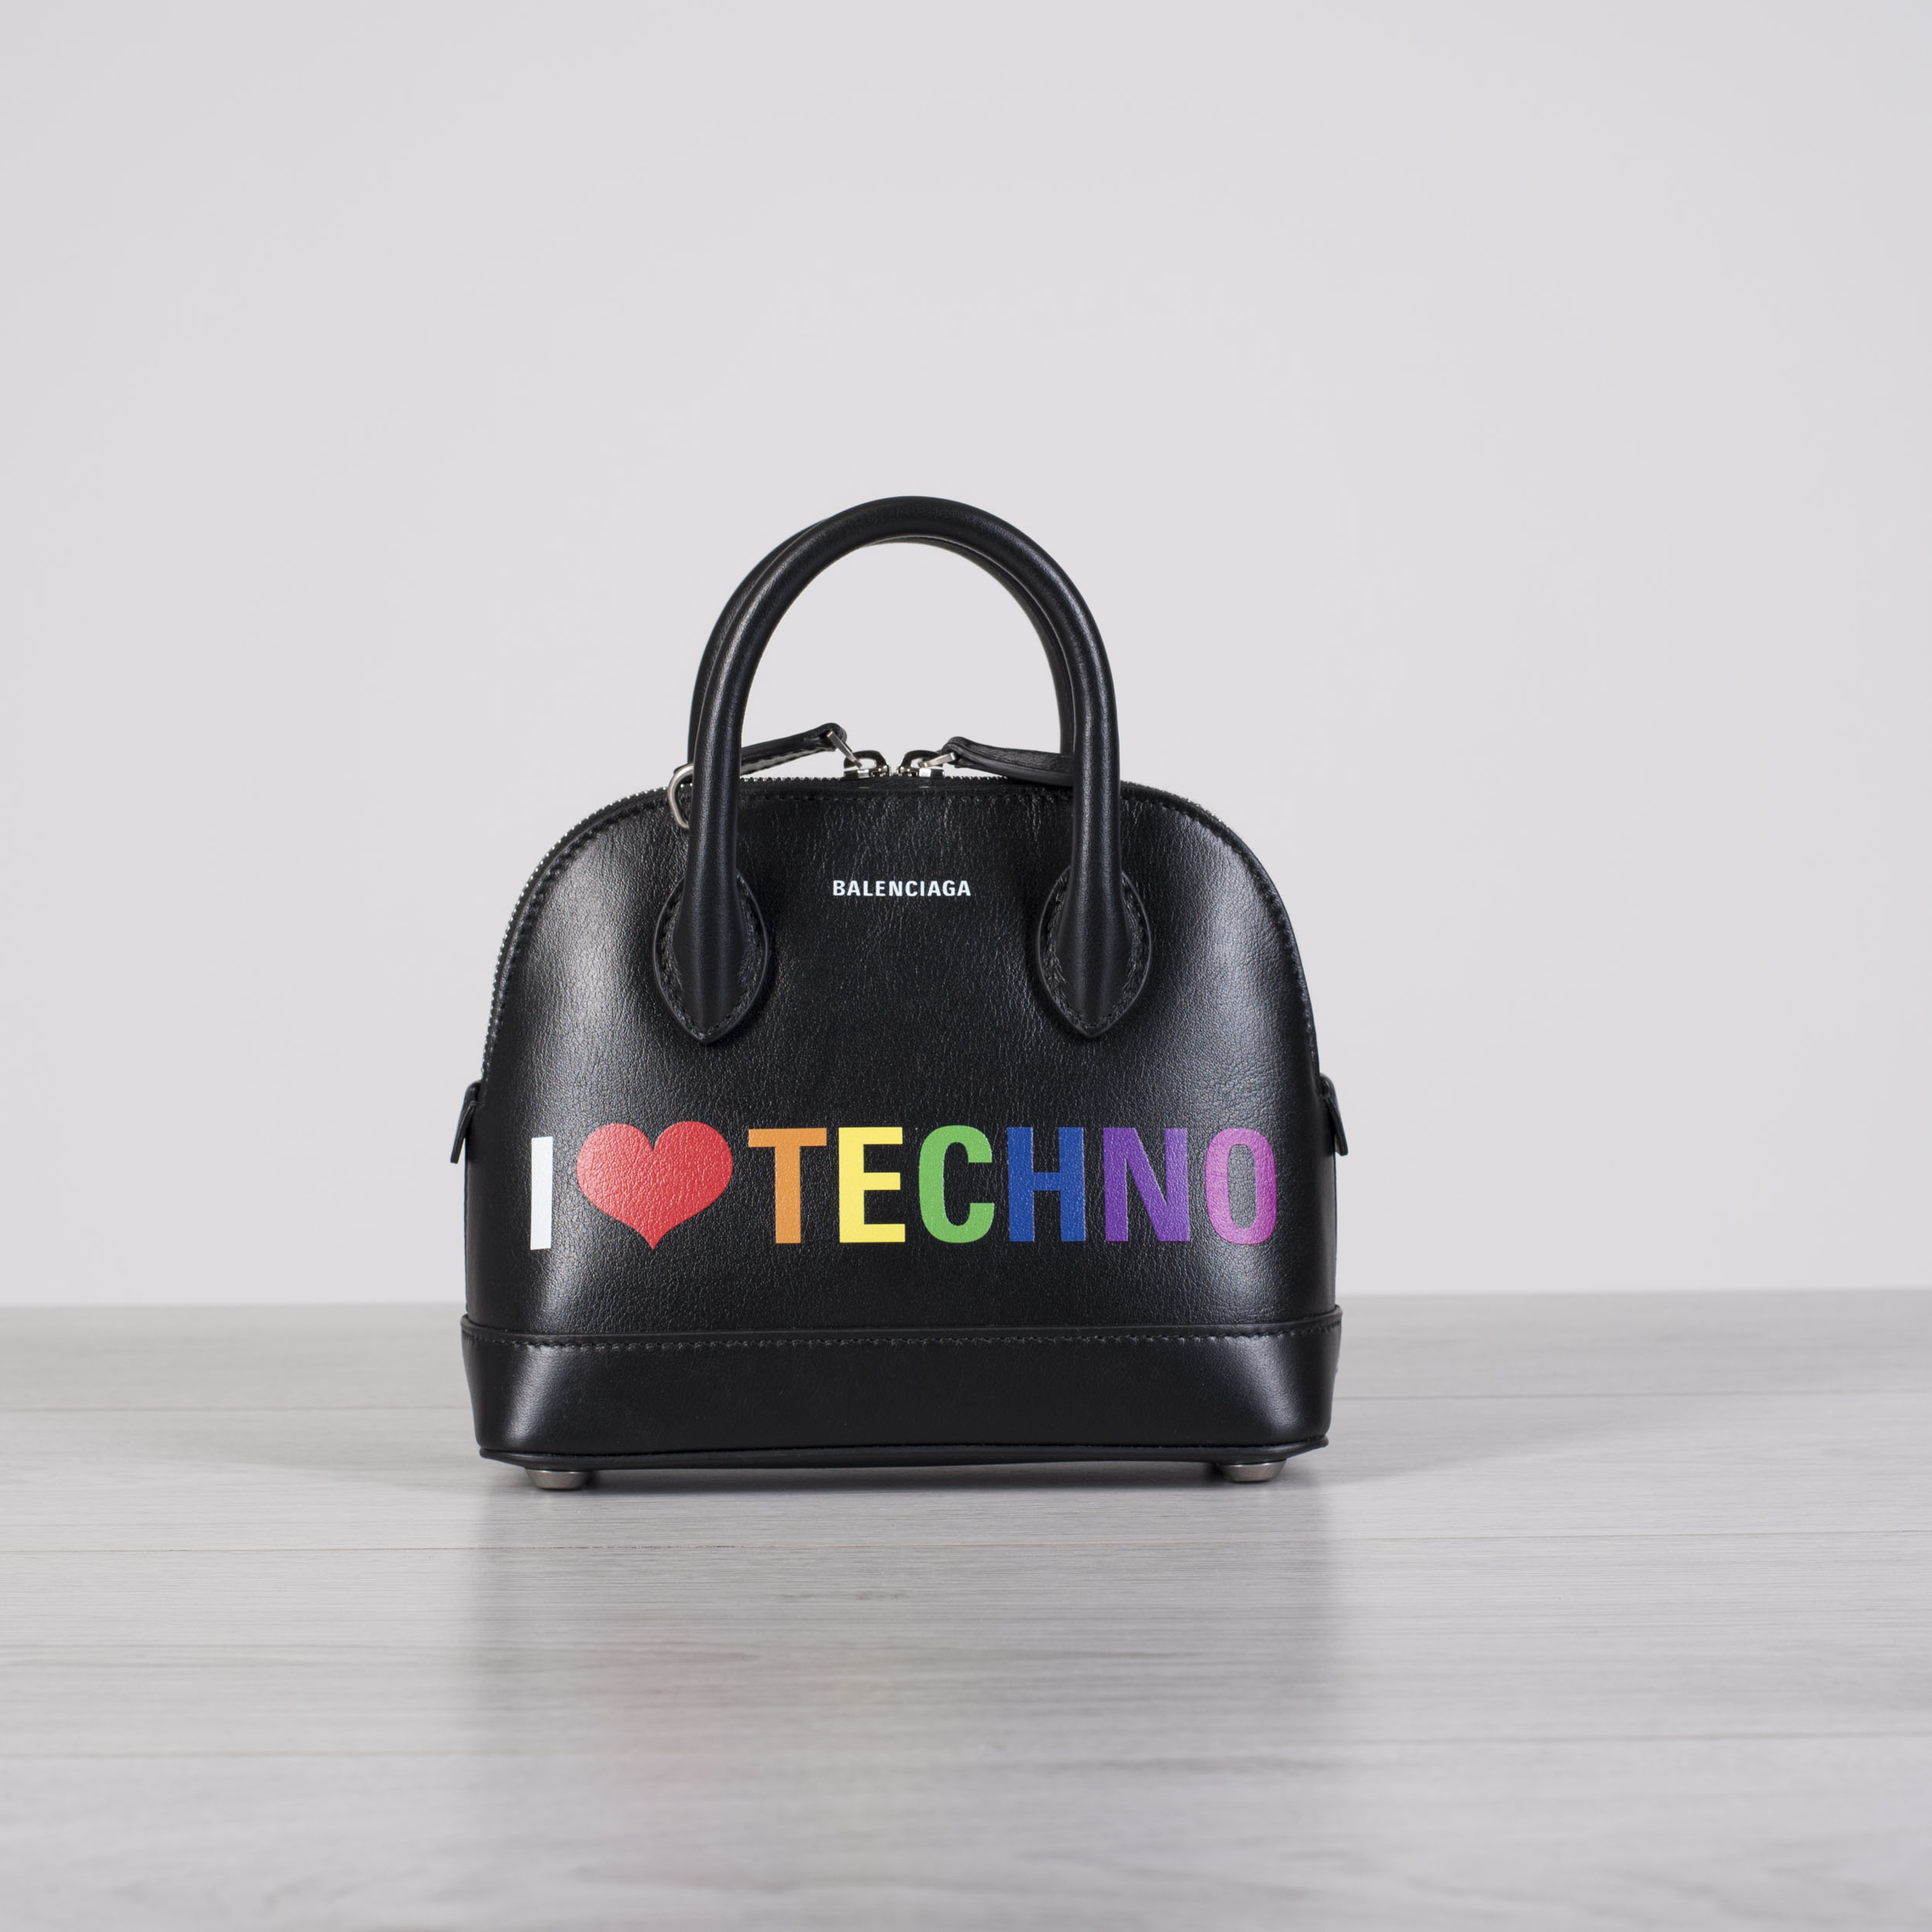 917446cb1a06fe Details about BALENCIAGA 1850$ I Love Techno Ville Top Handle XXS Mini Bag  In Black Leather